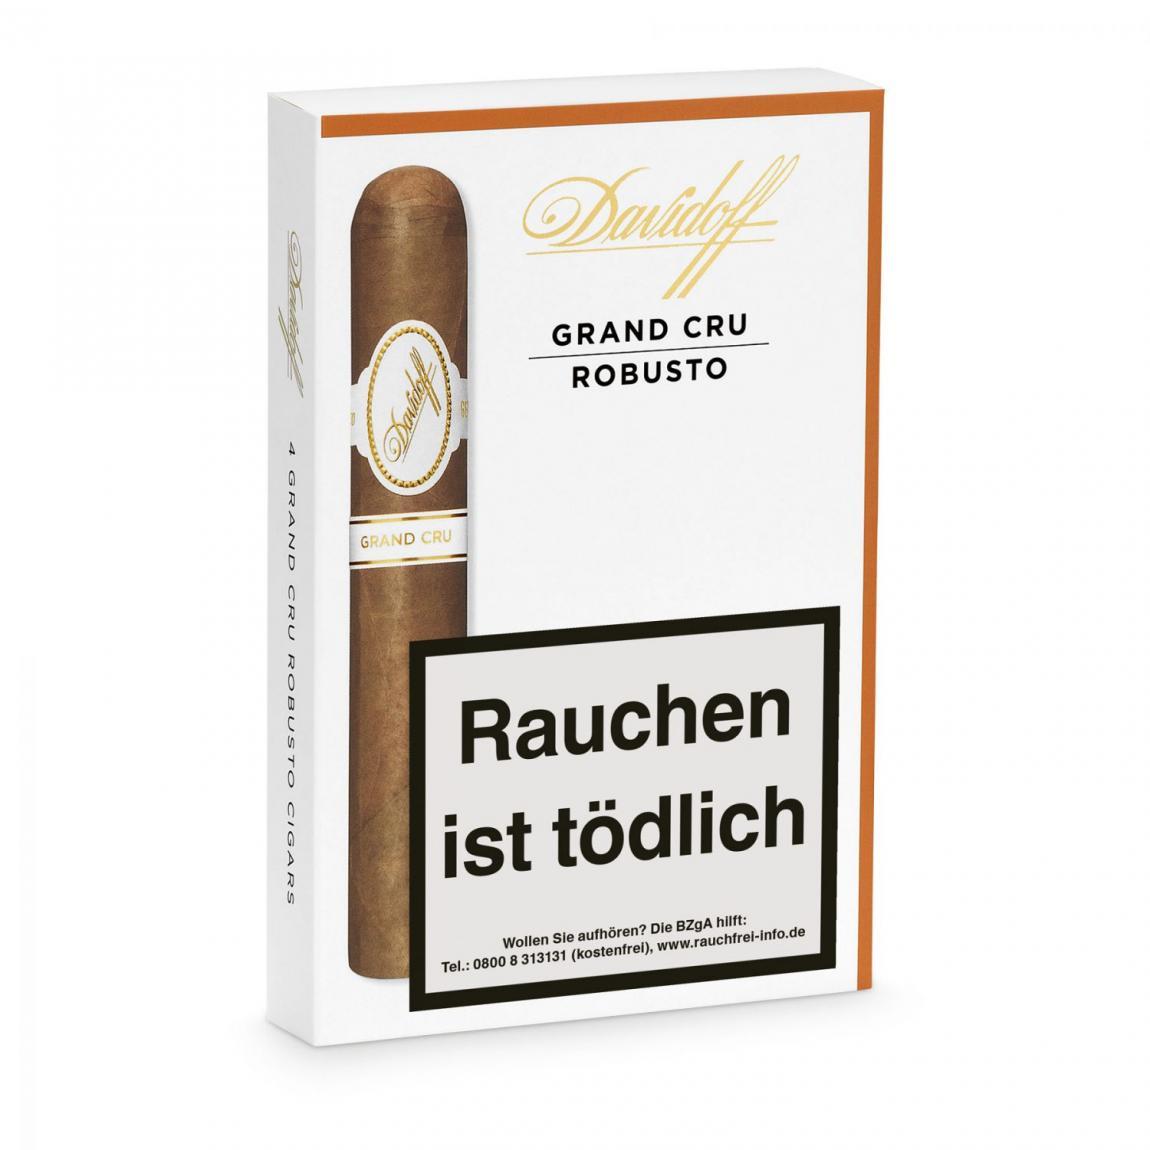 Davidoff »Grand Cru« Robusto, 4er Schachtel